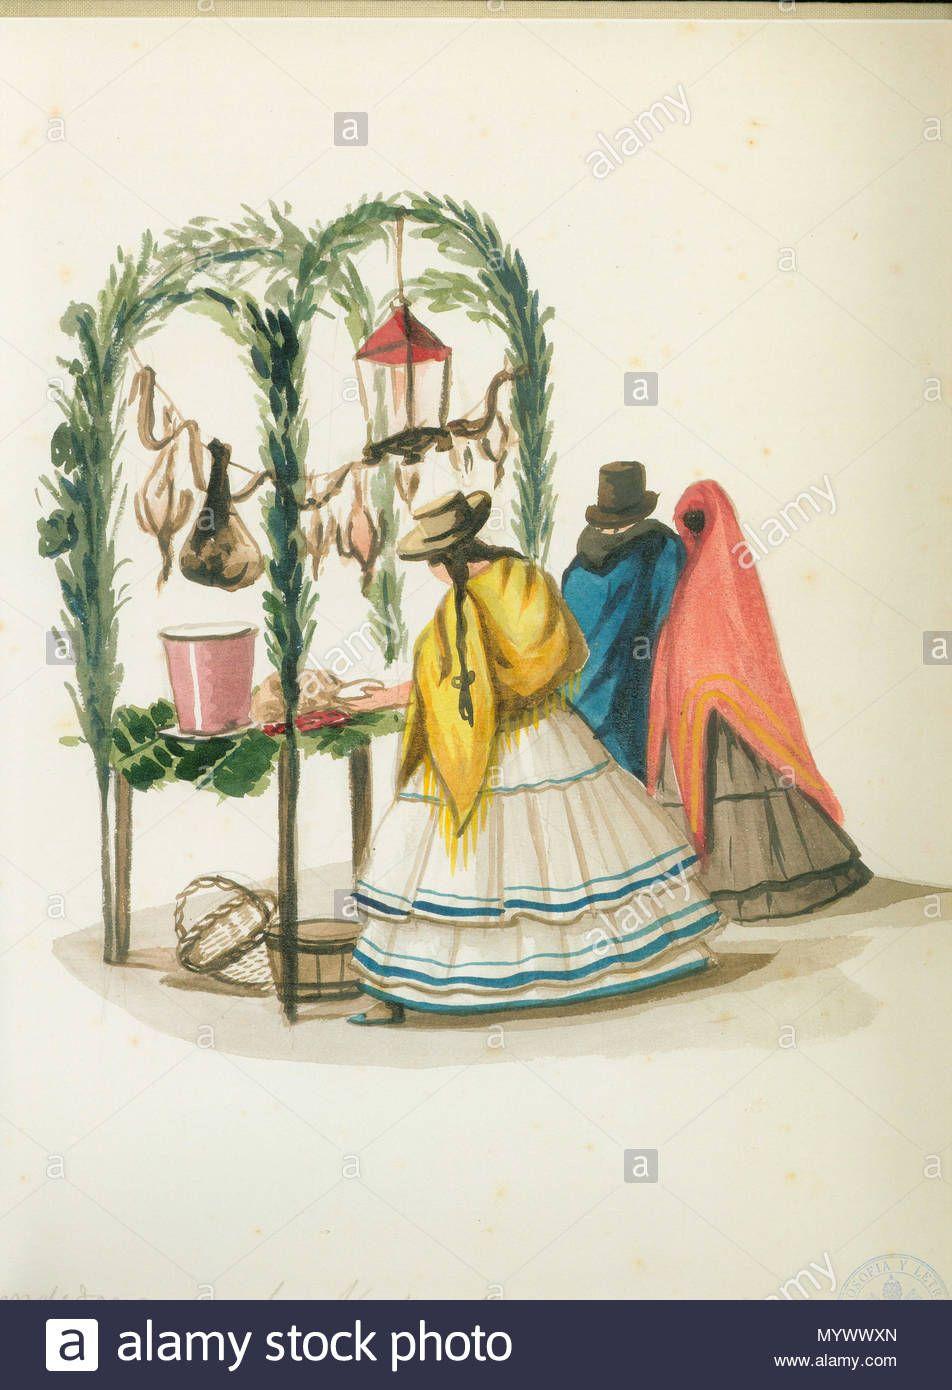 Tapada limeña - Buscar con Google (con imágenes)   Limeña, Tapas, Acuarela